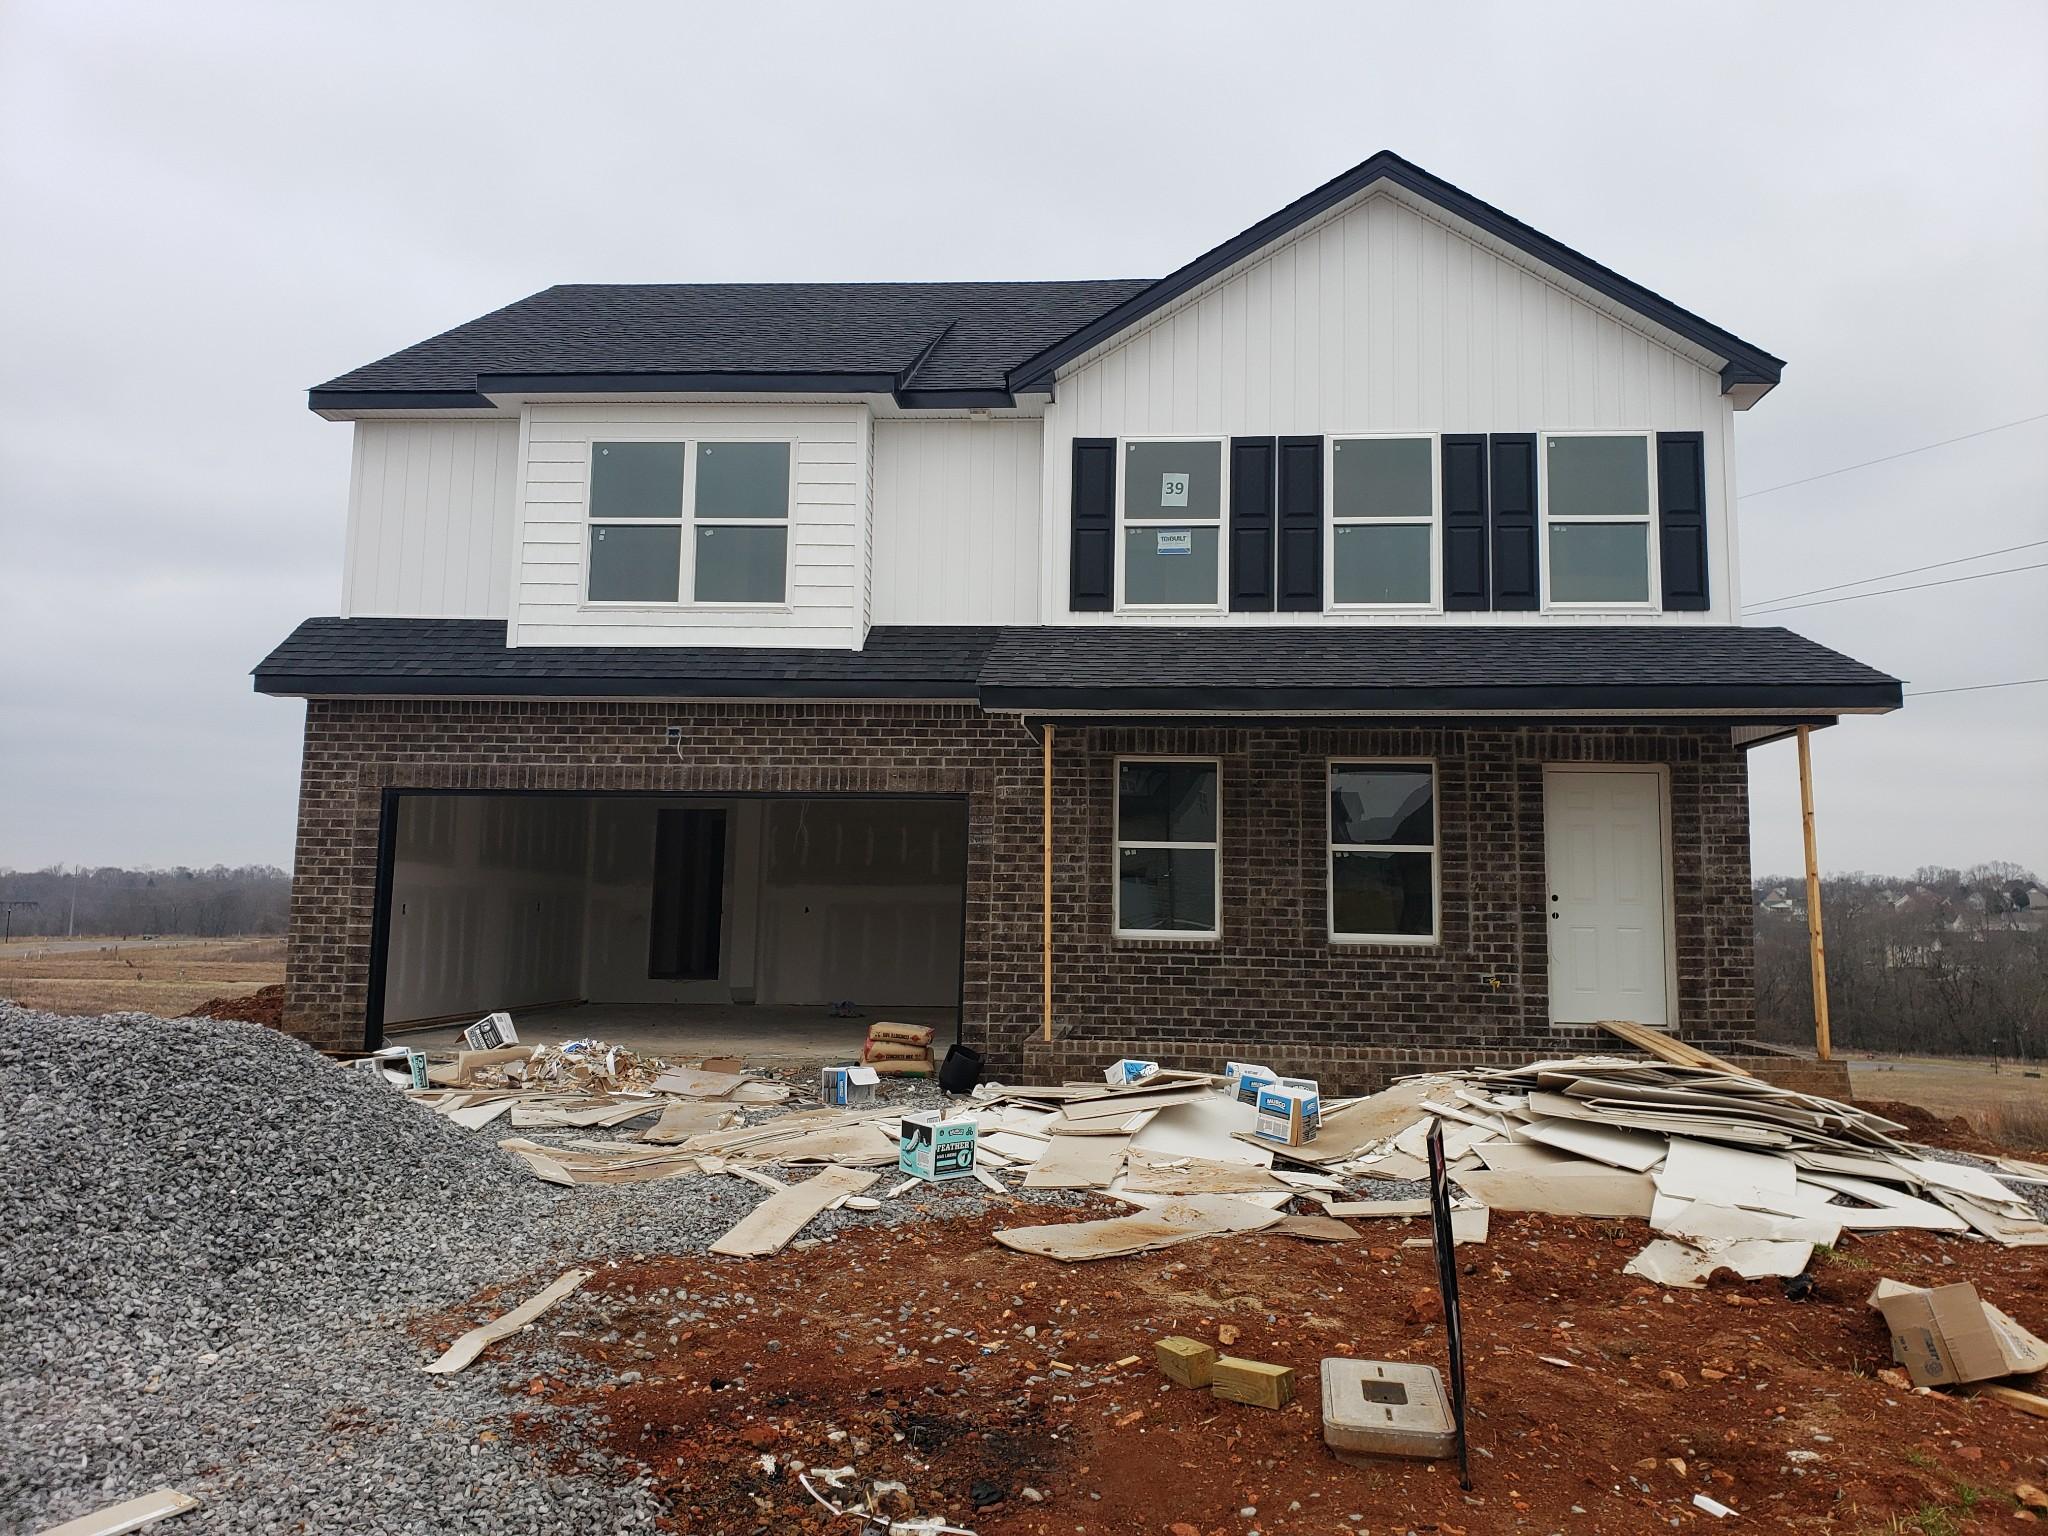 891 Wild Elm Ct (lot 39), Clarksville, TN 37042 - Clarksville, TN real estate listing